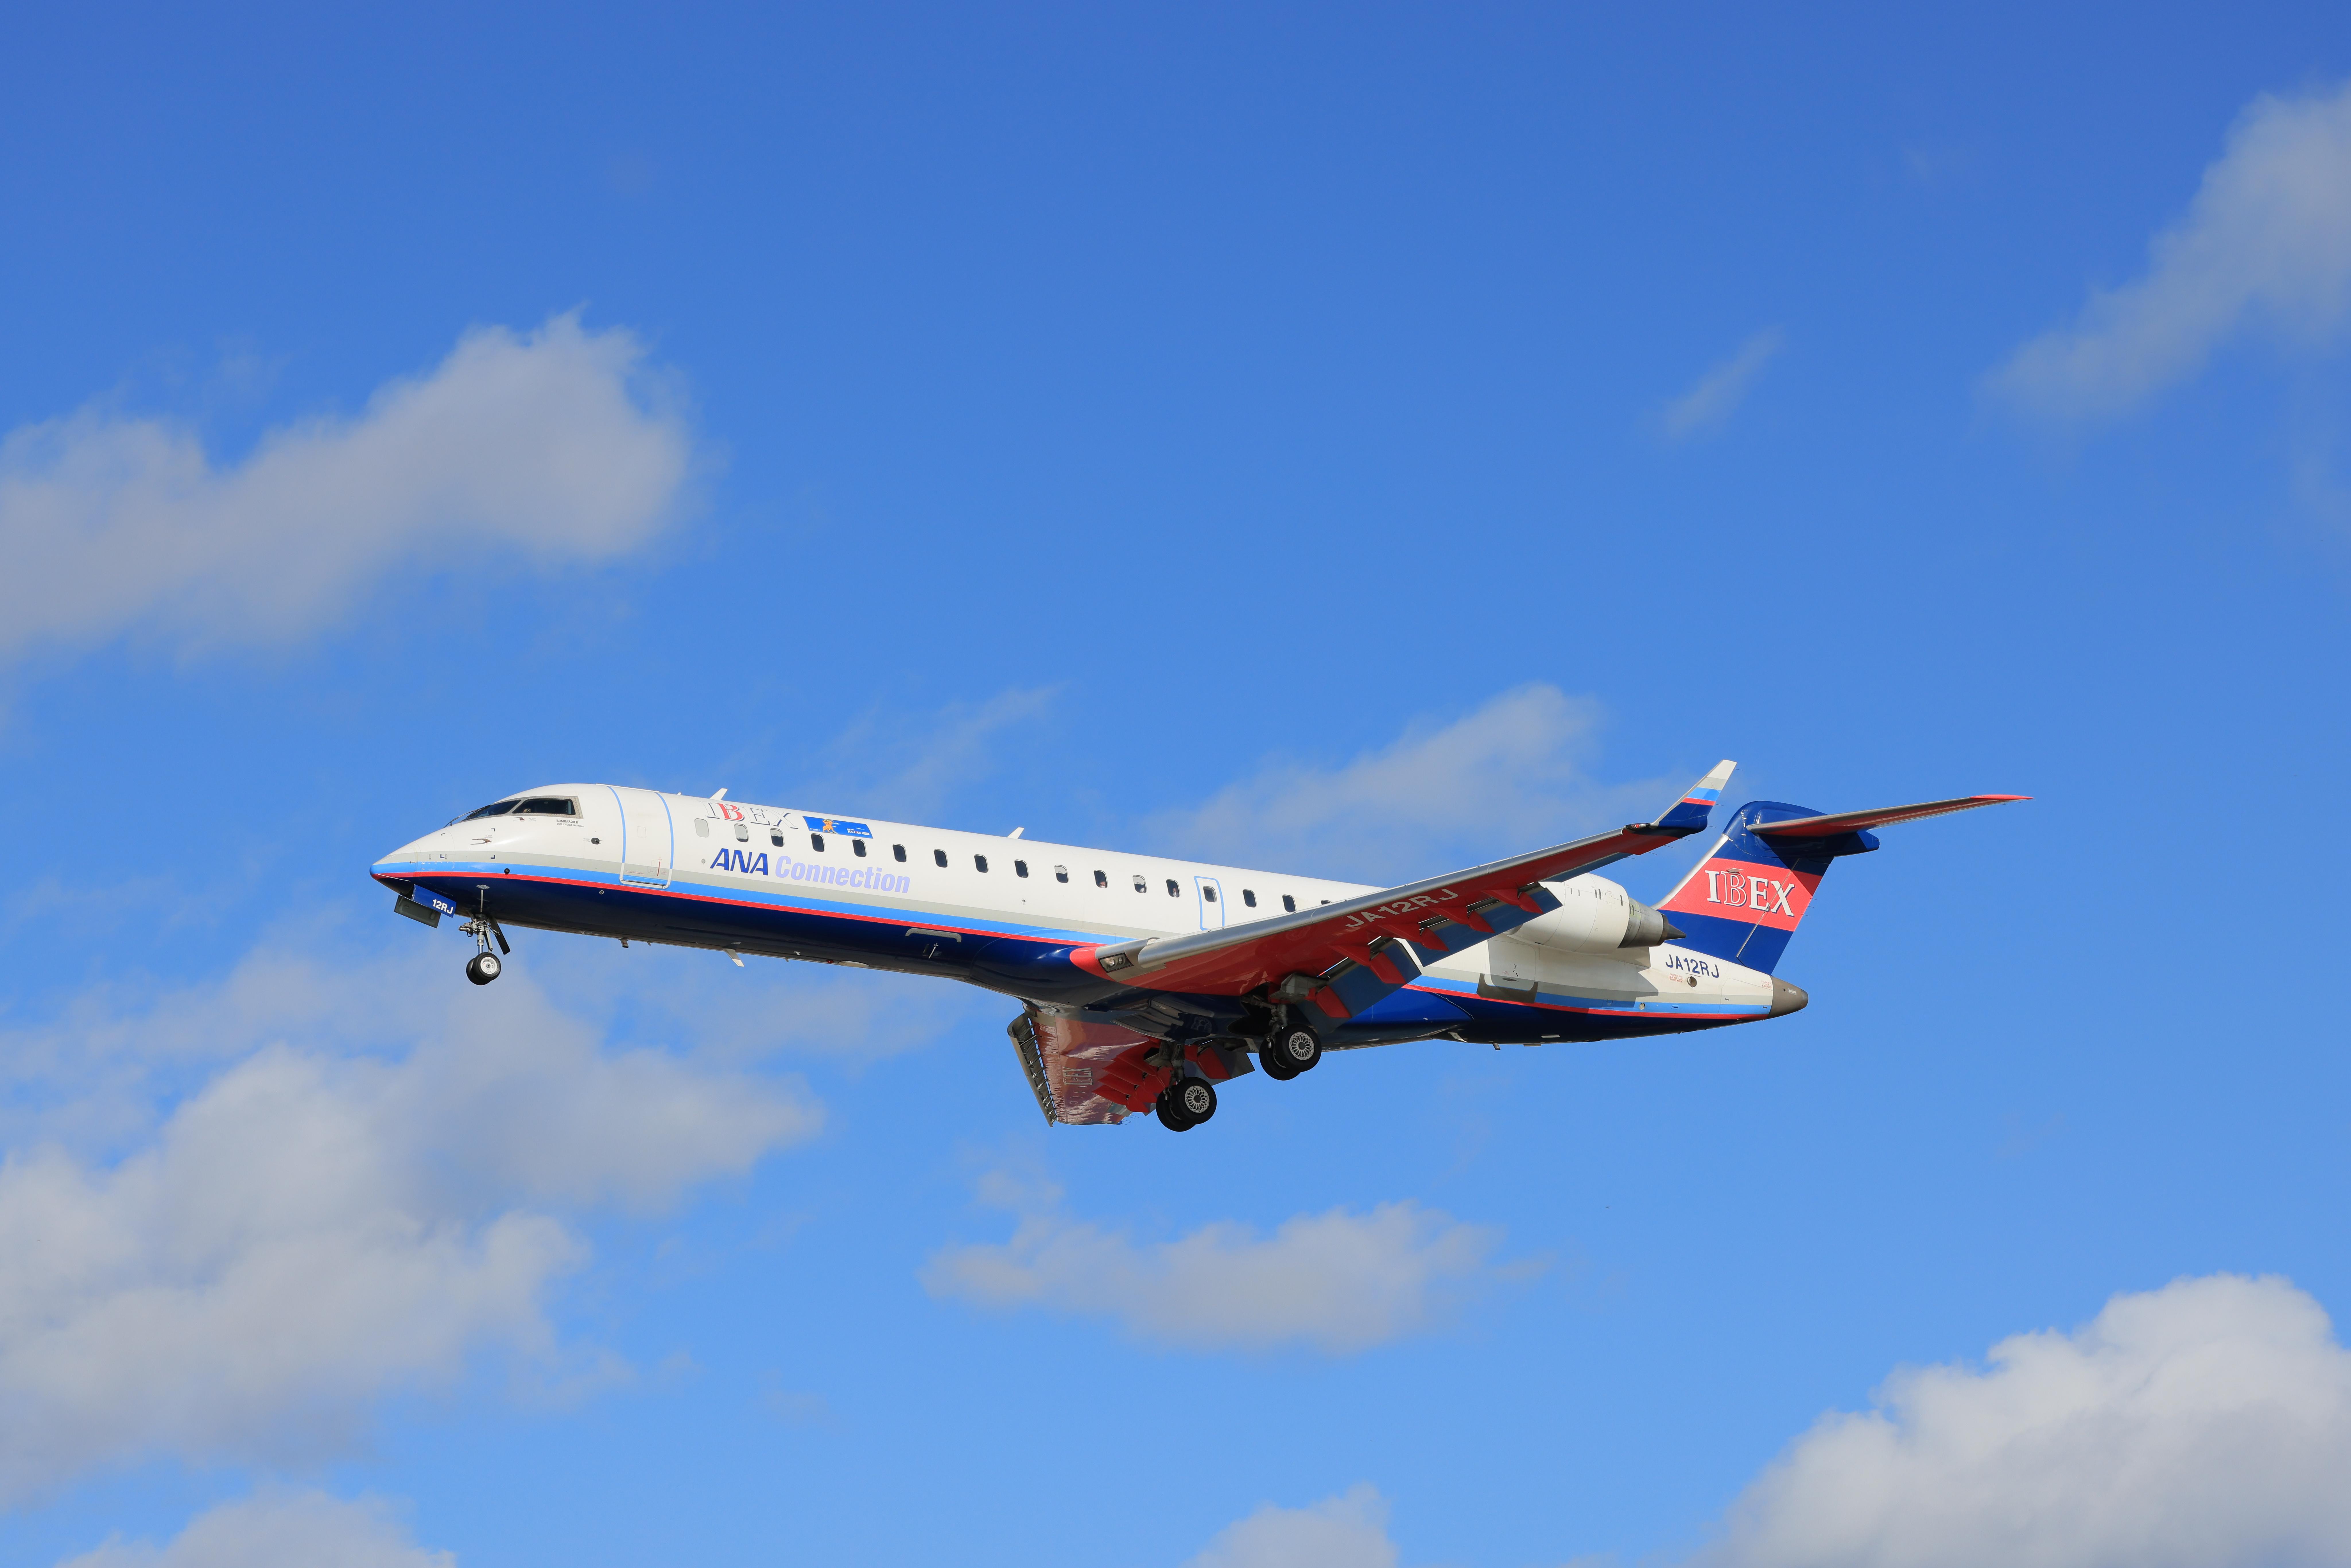 <b>【アイベックスエアラインズ】 </b>鹿児島と名古屋・大阪を結ぶ航空会社の、ペア往復航空券プレゼント企画第2弾!